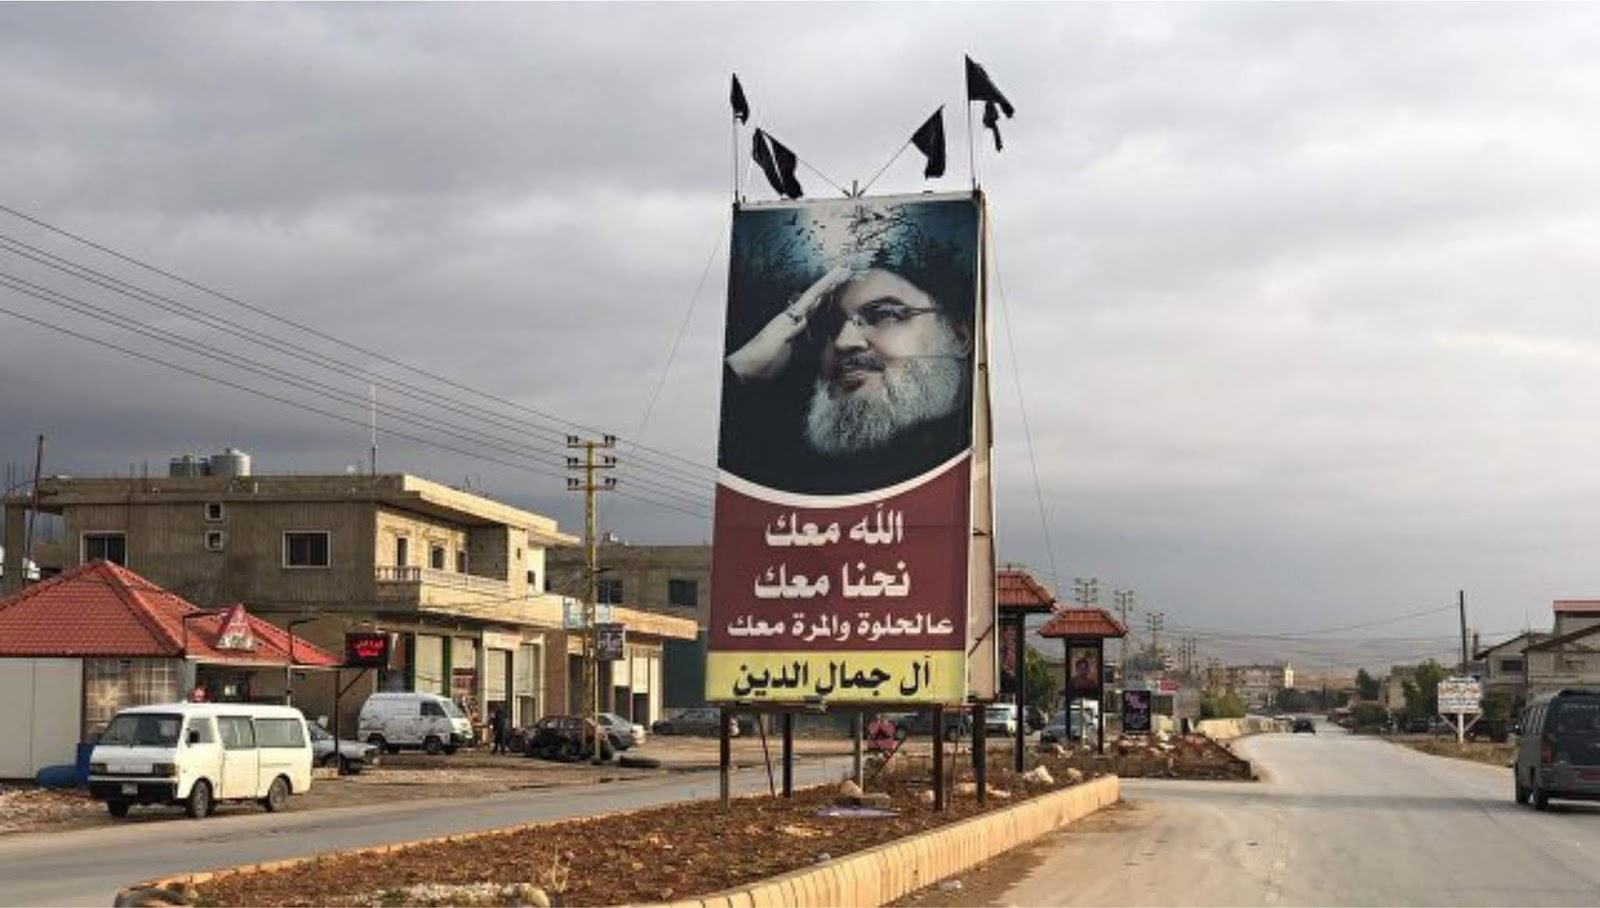 Kerajaan Teluk Persia melakukan normalisasi hubungan dengan Israel Keputusan Saudi